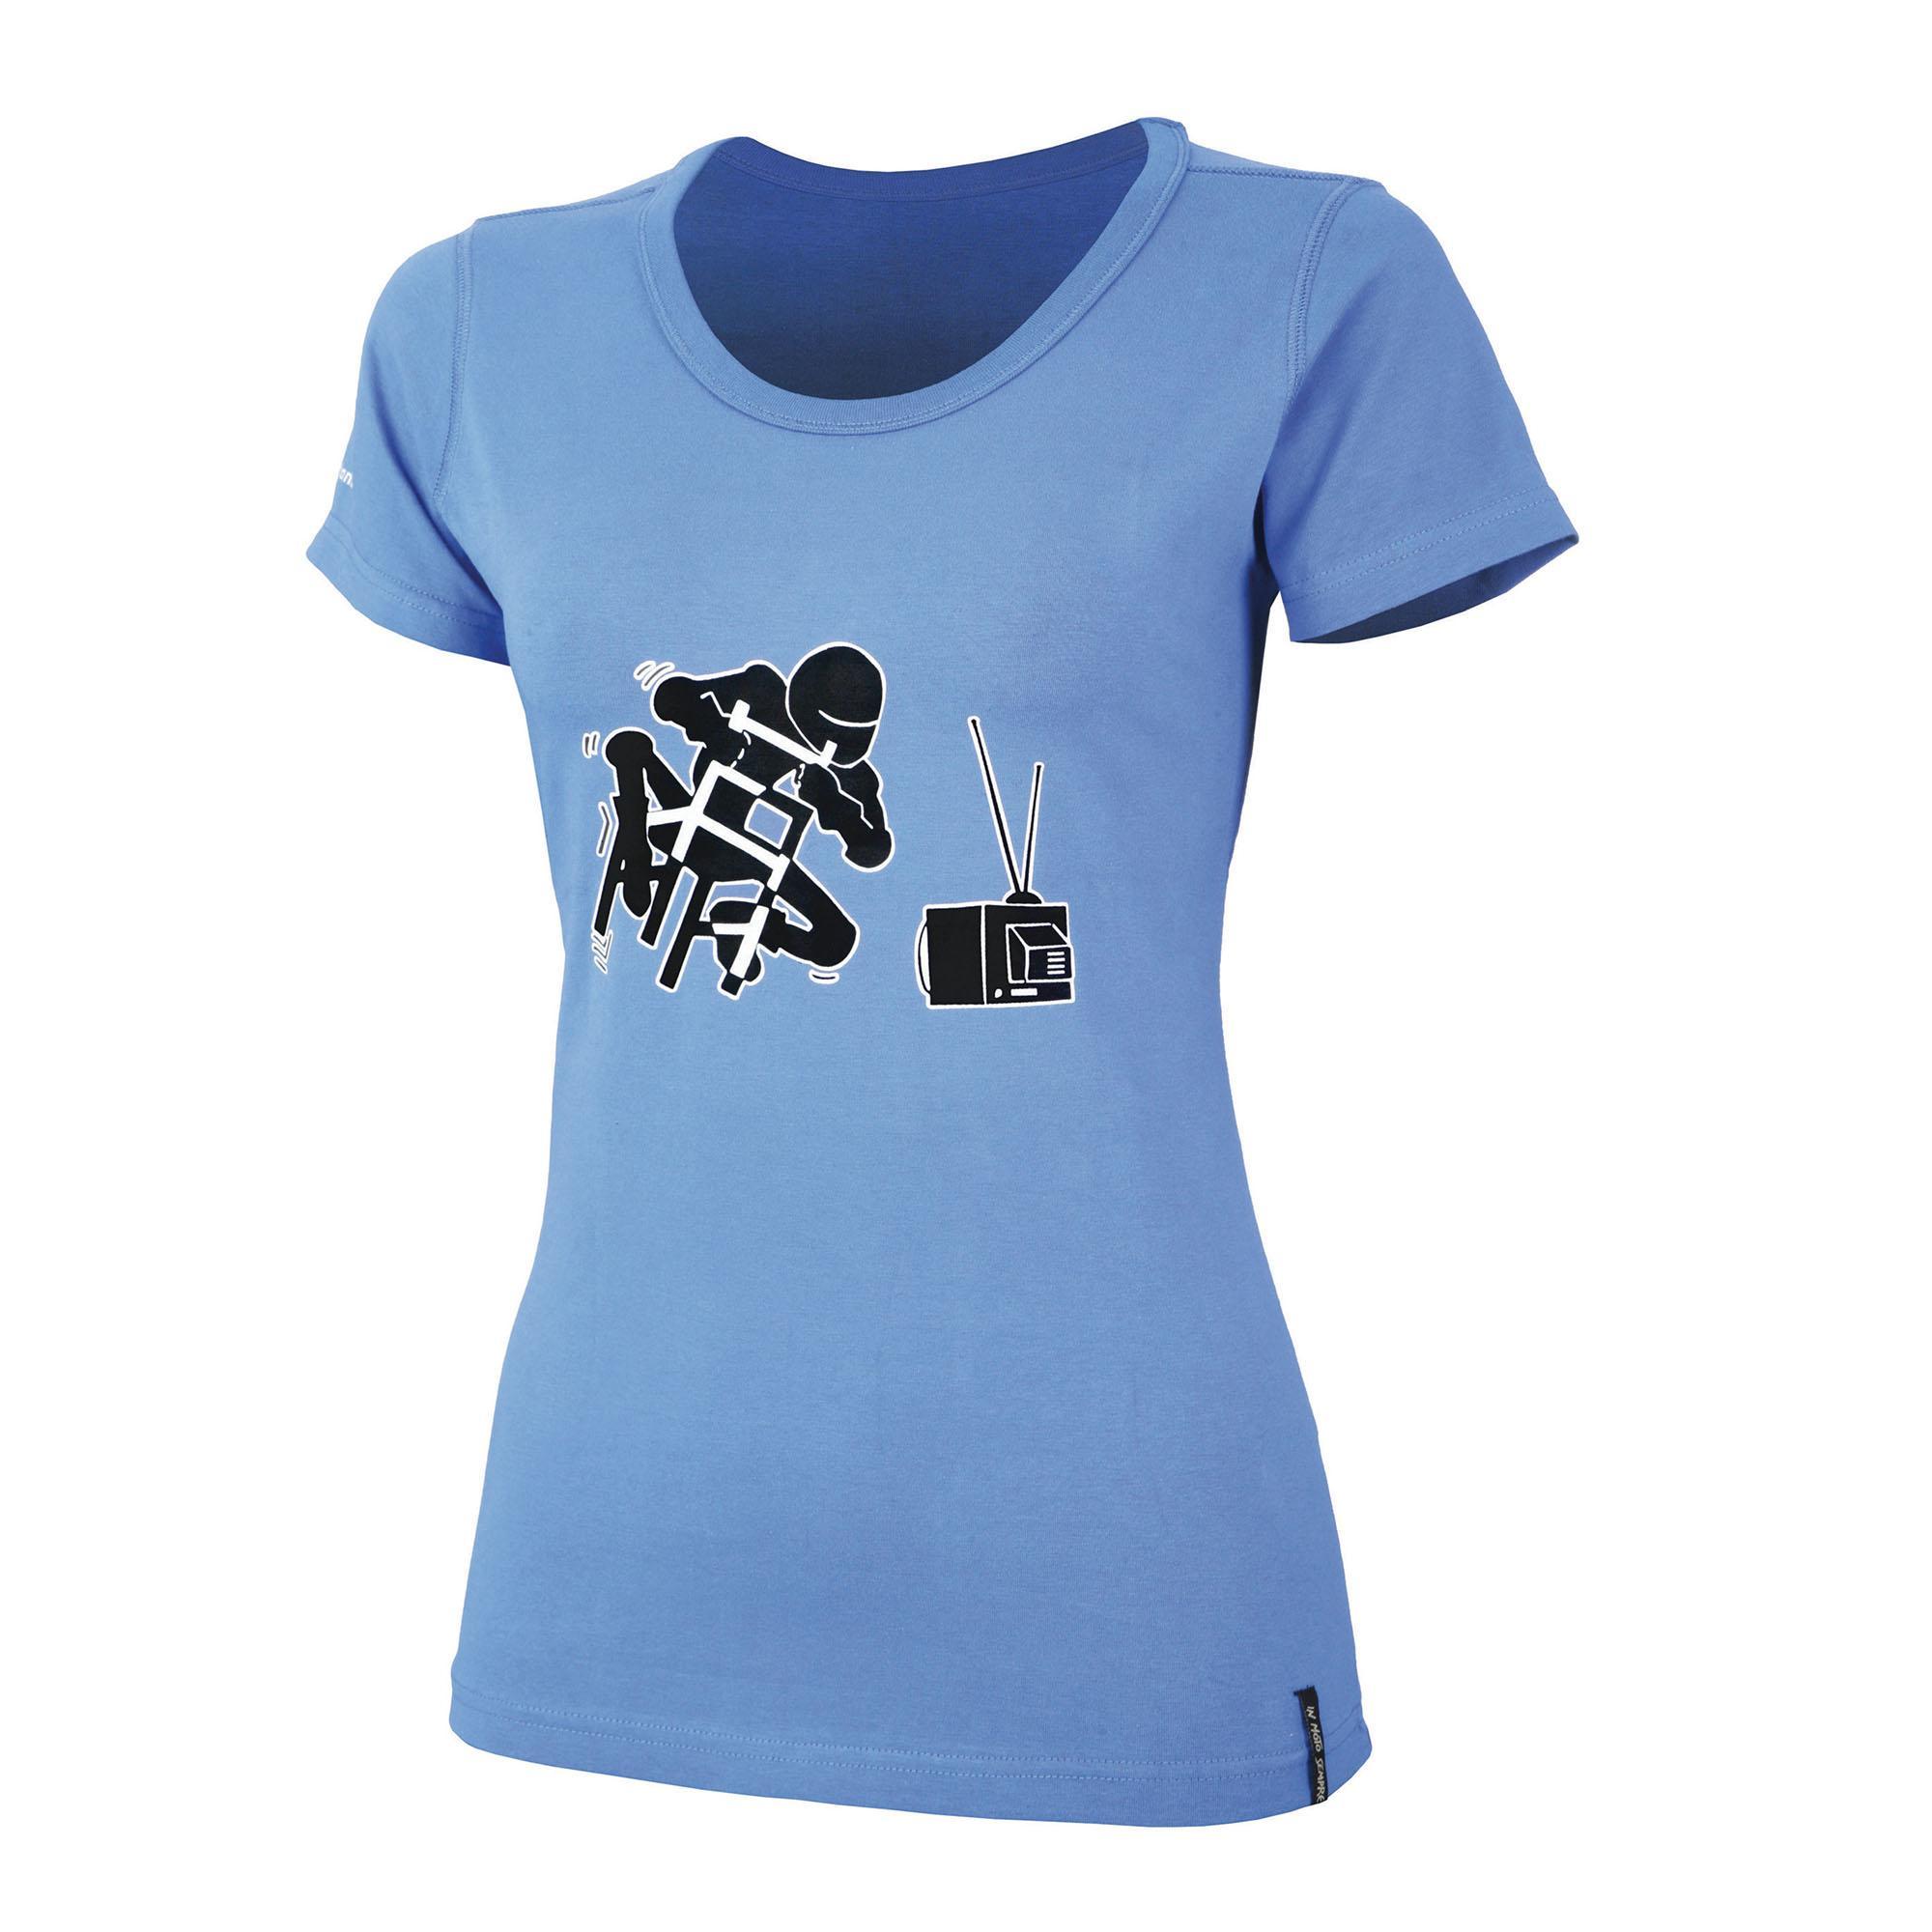 T-shirt Tu Code Lady curve on blue